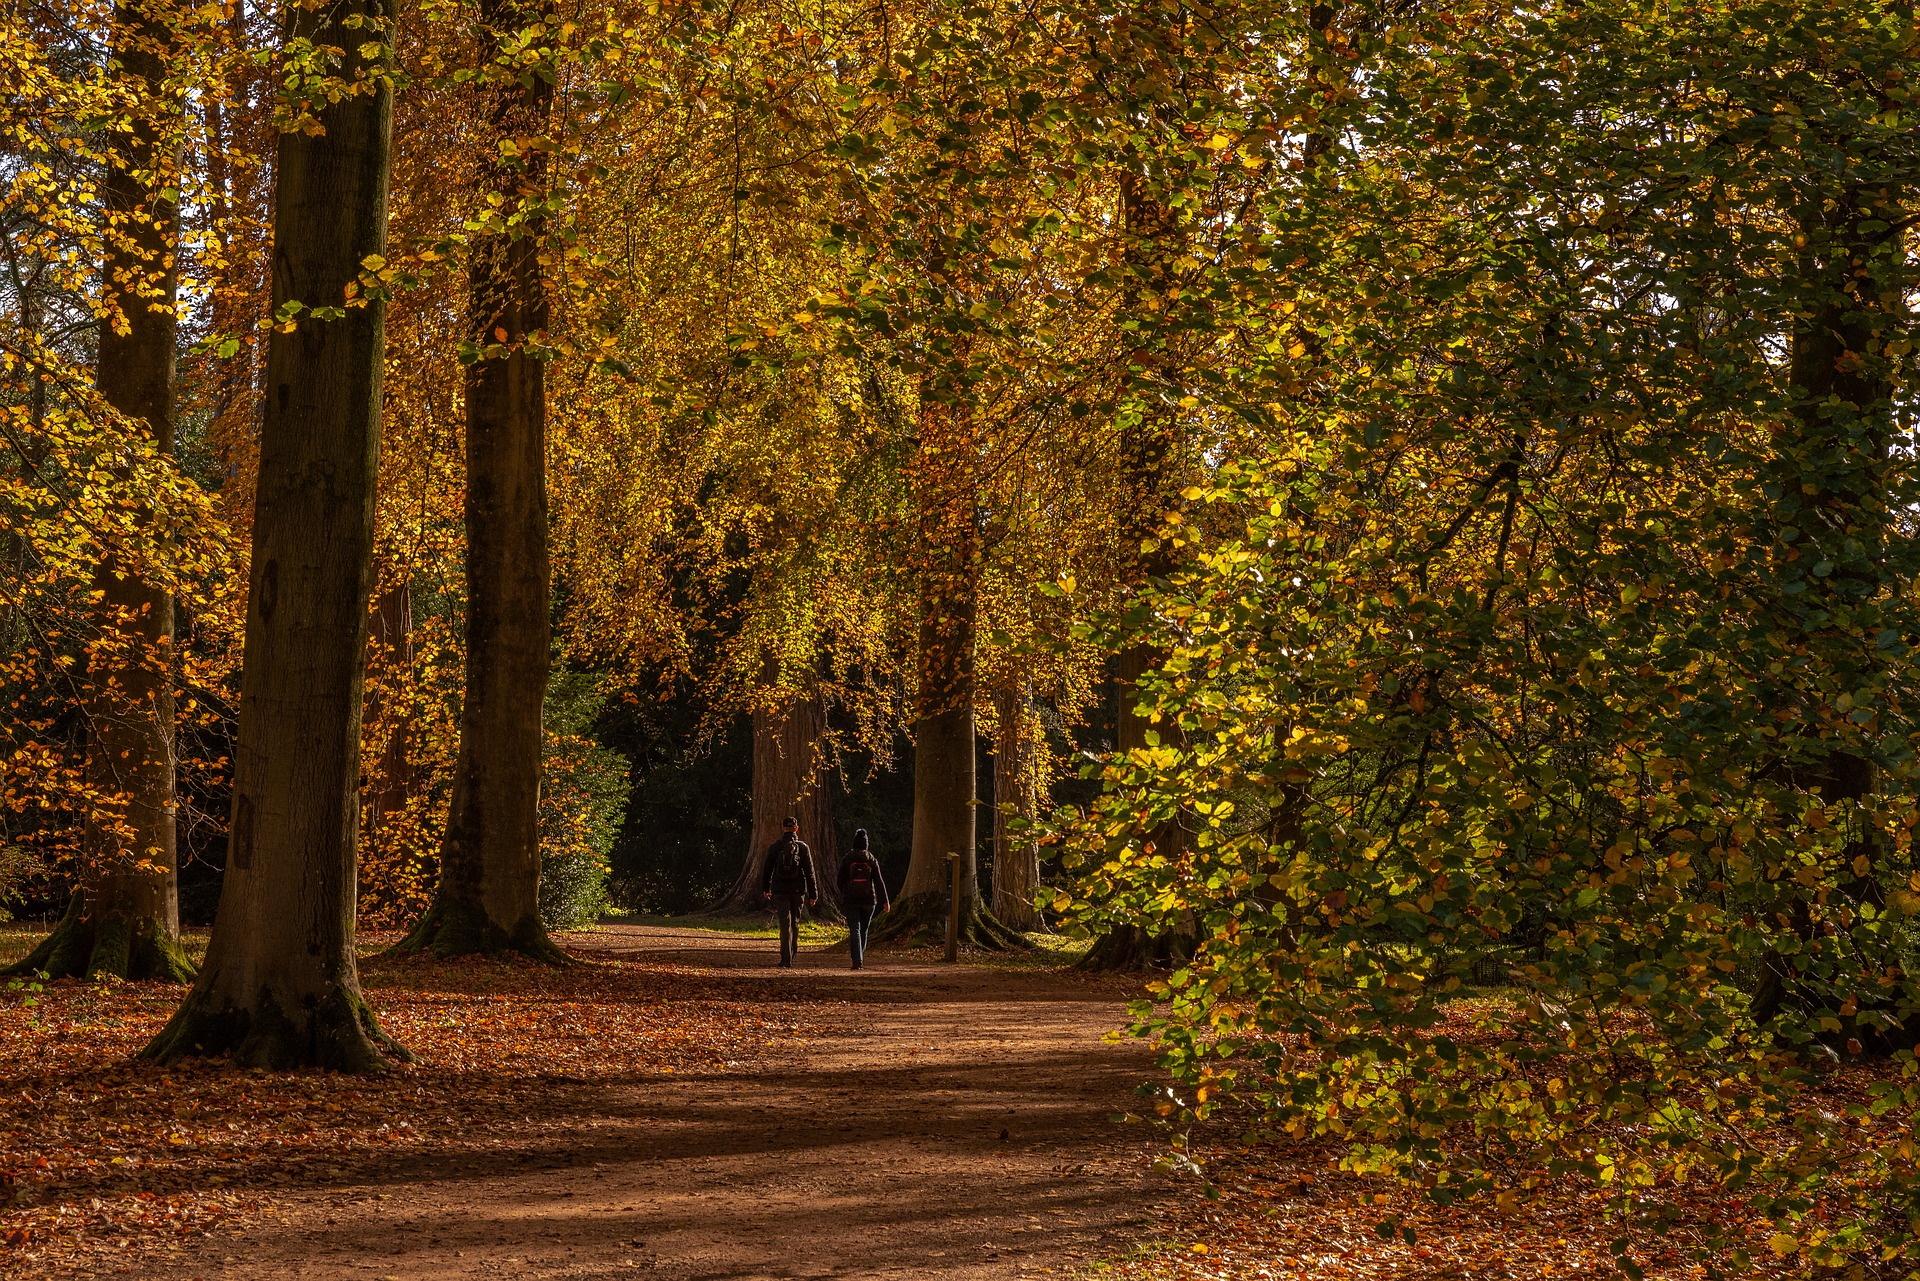 Trees and woods at Westonbirt Arboretum